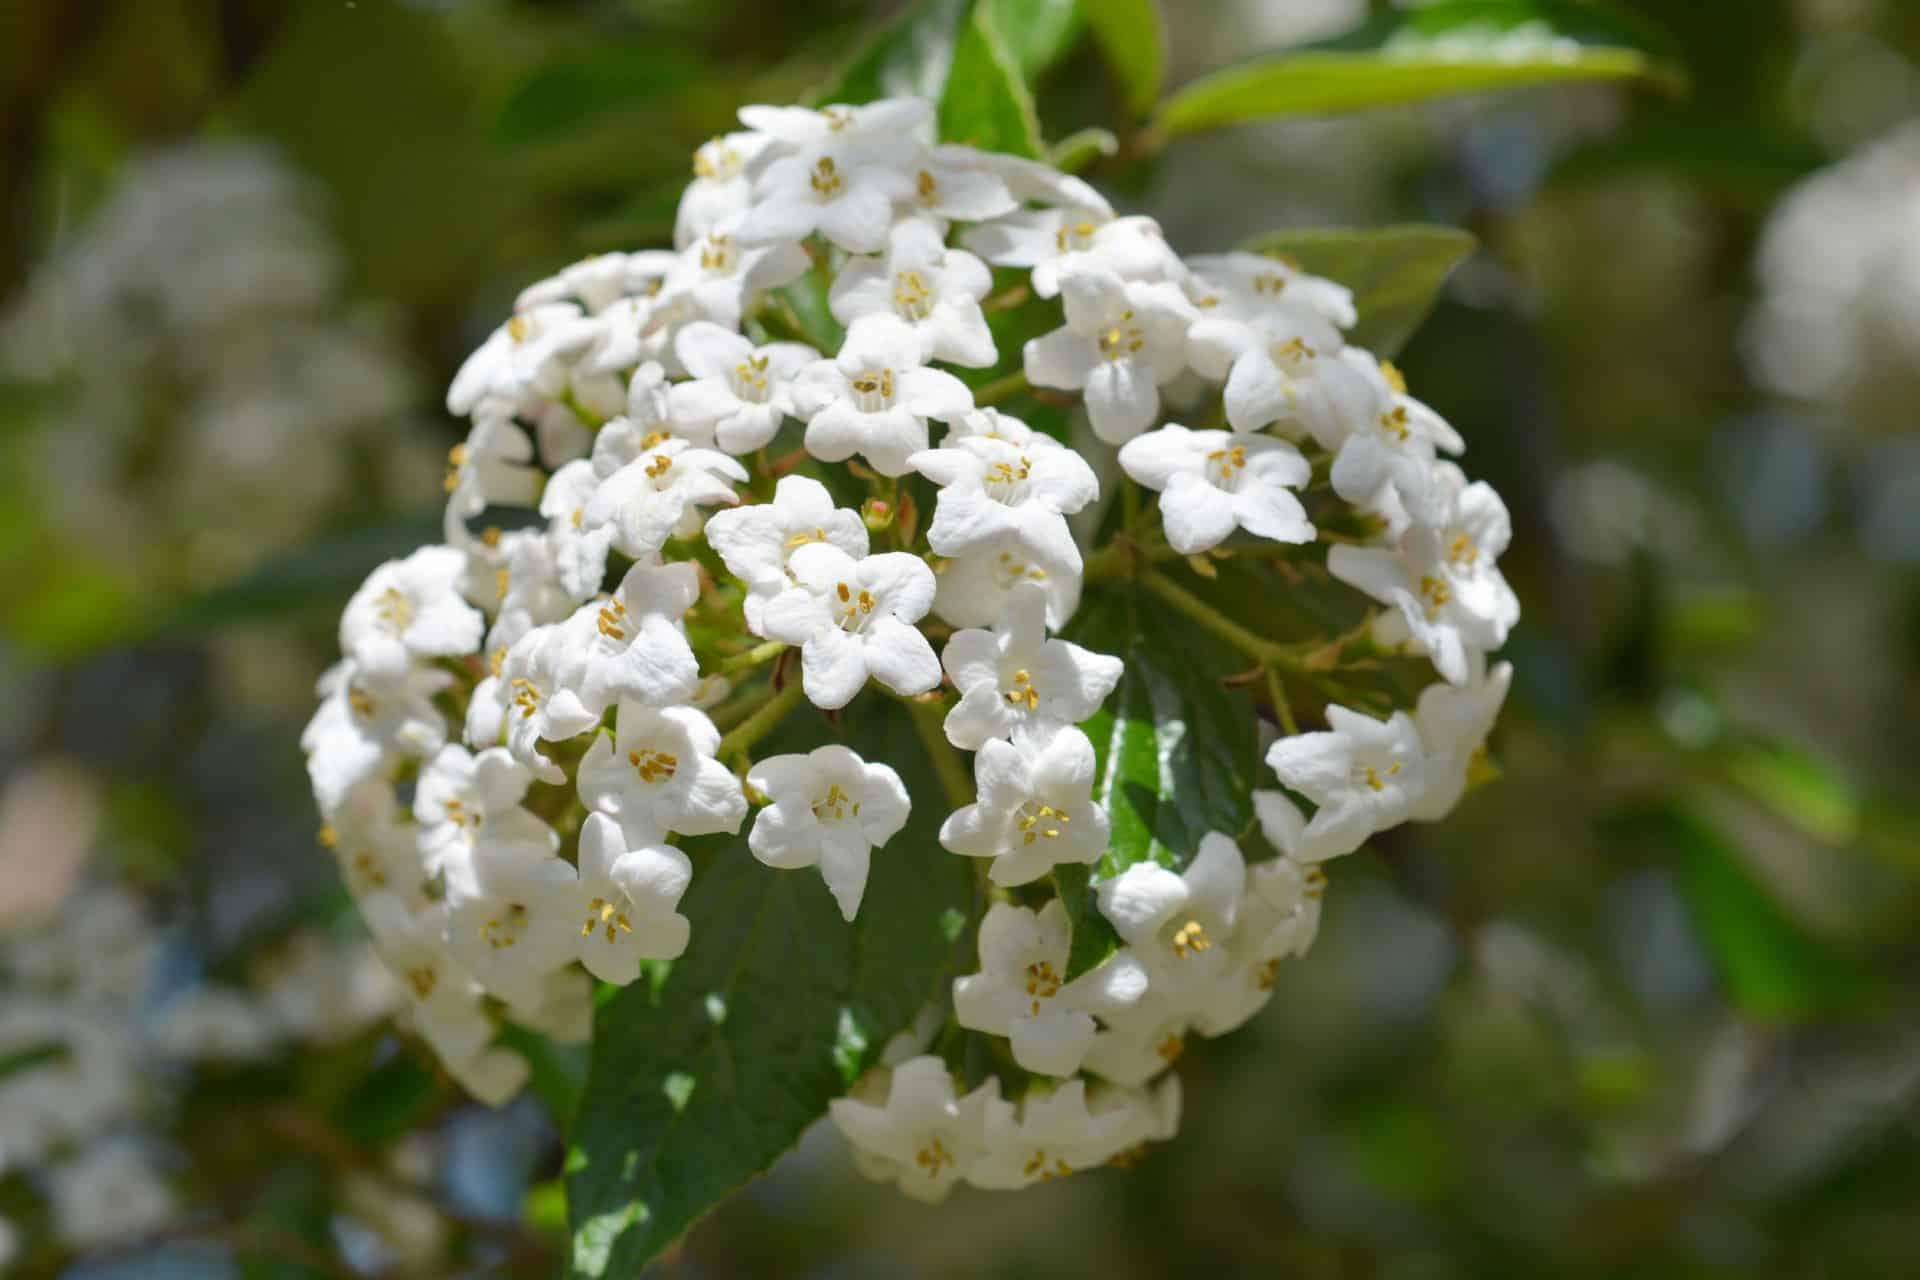 Korean spice viburnum has a pleasant fragrance.